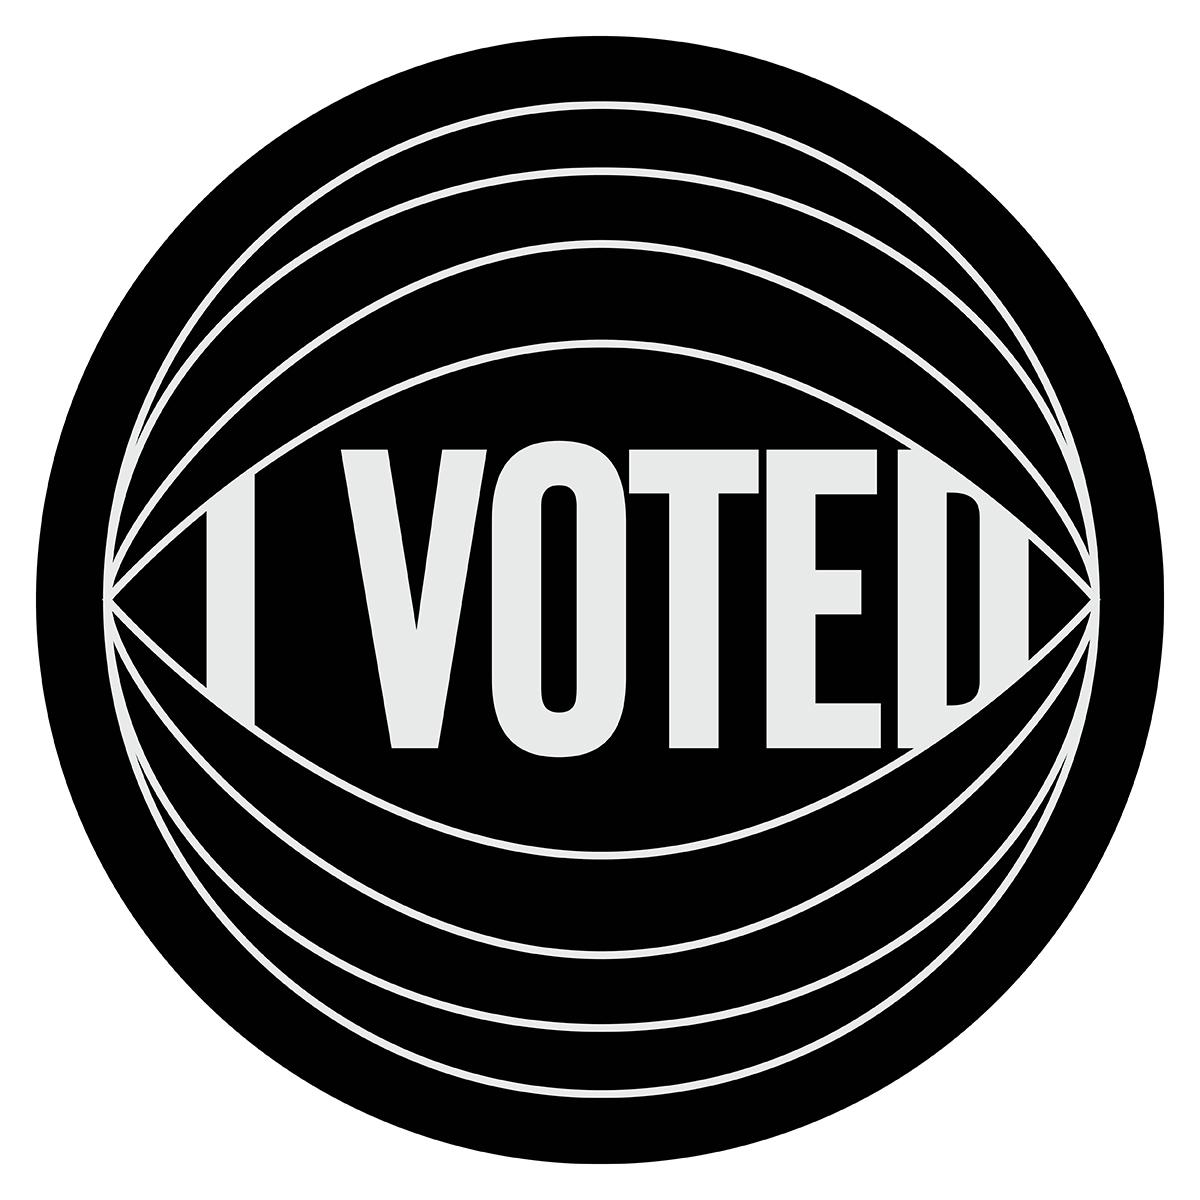 Hank Willis Thomas'I Voted' sticker, via New York Magazine.